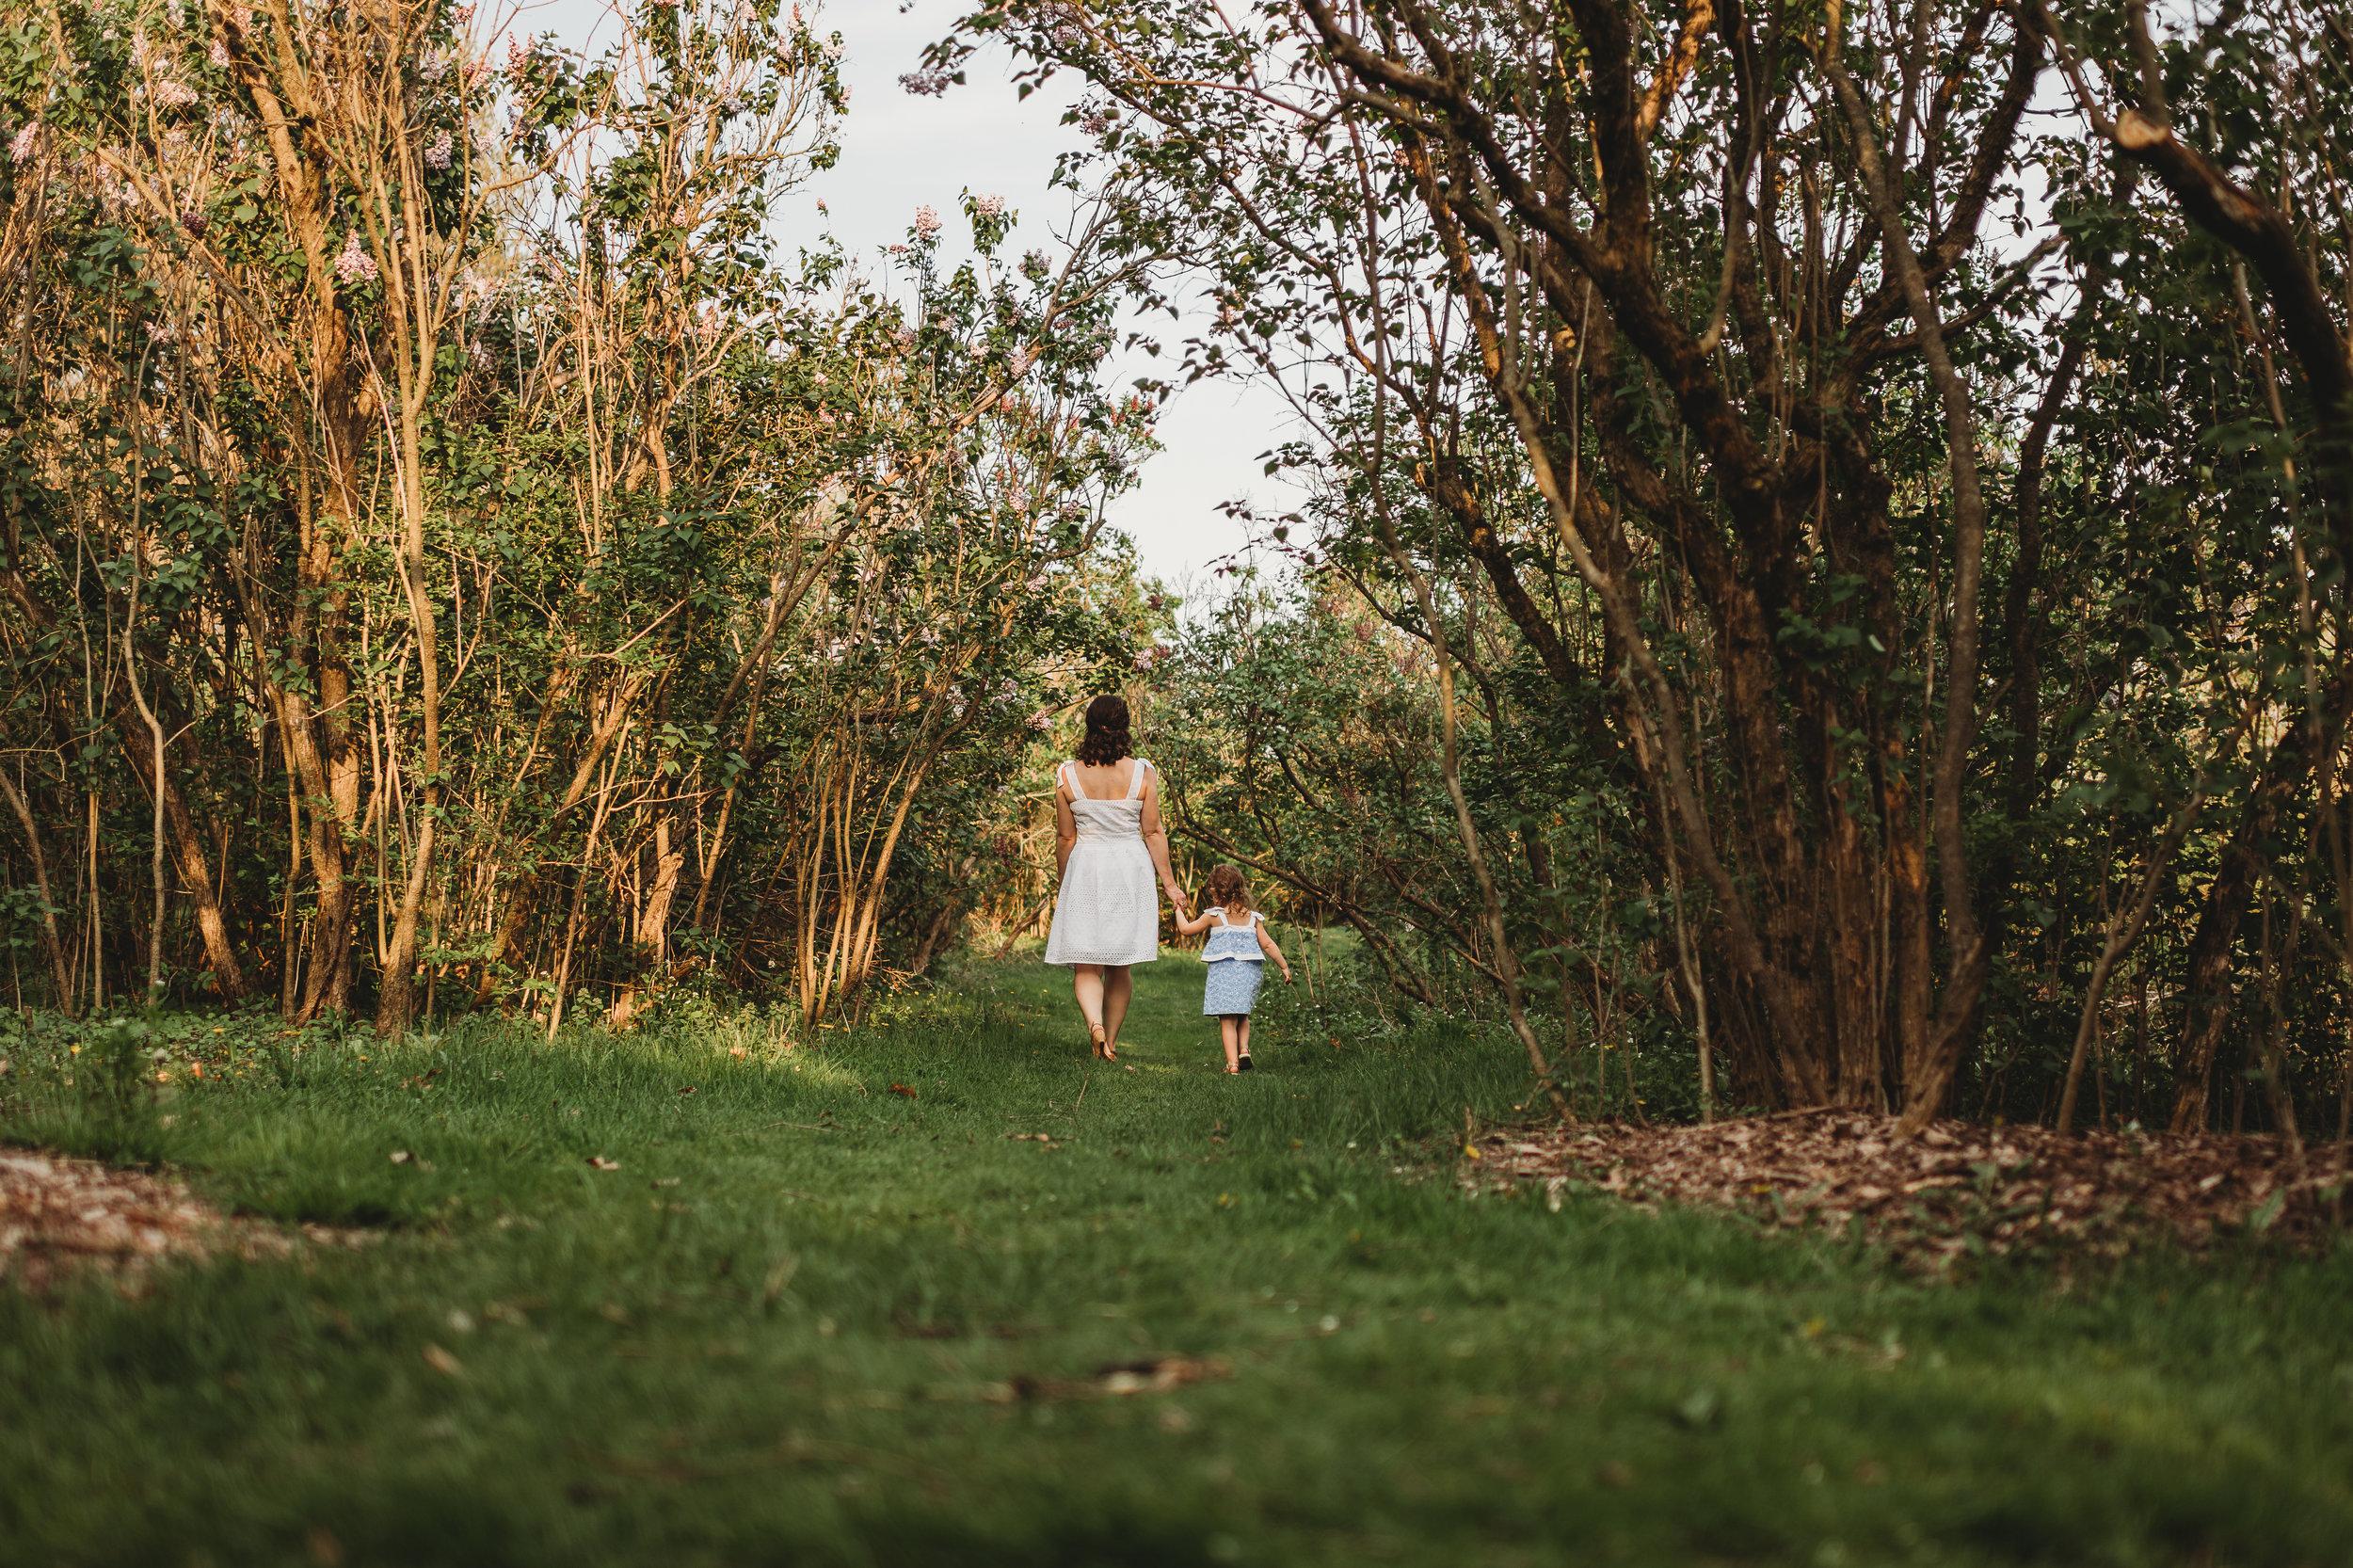 Laudien_Motherhood_New _Jersey_Photographer_Rutgers_Gardens_5